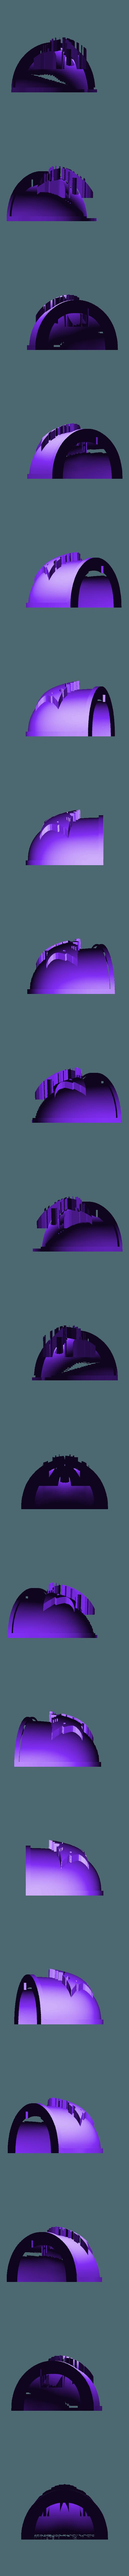 Morkai_Rep_MKIV_Pad.stl Download free STL file Double Wolf head Chapter insignia • 3D printing model, Tatsura